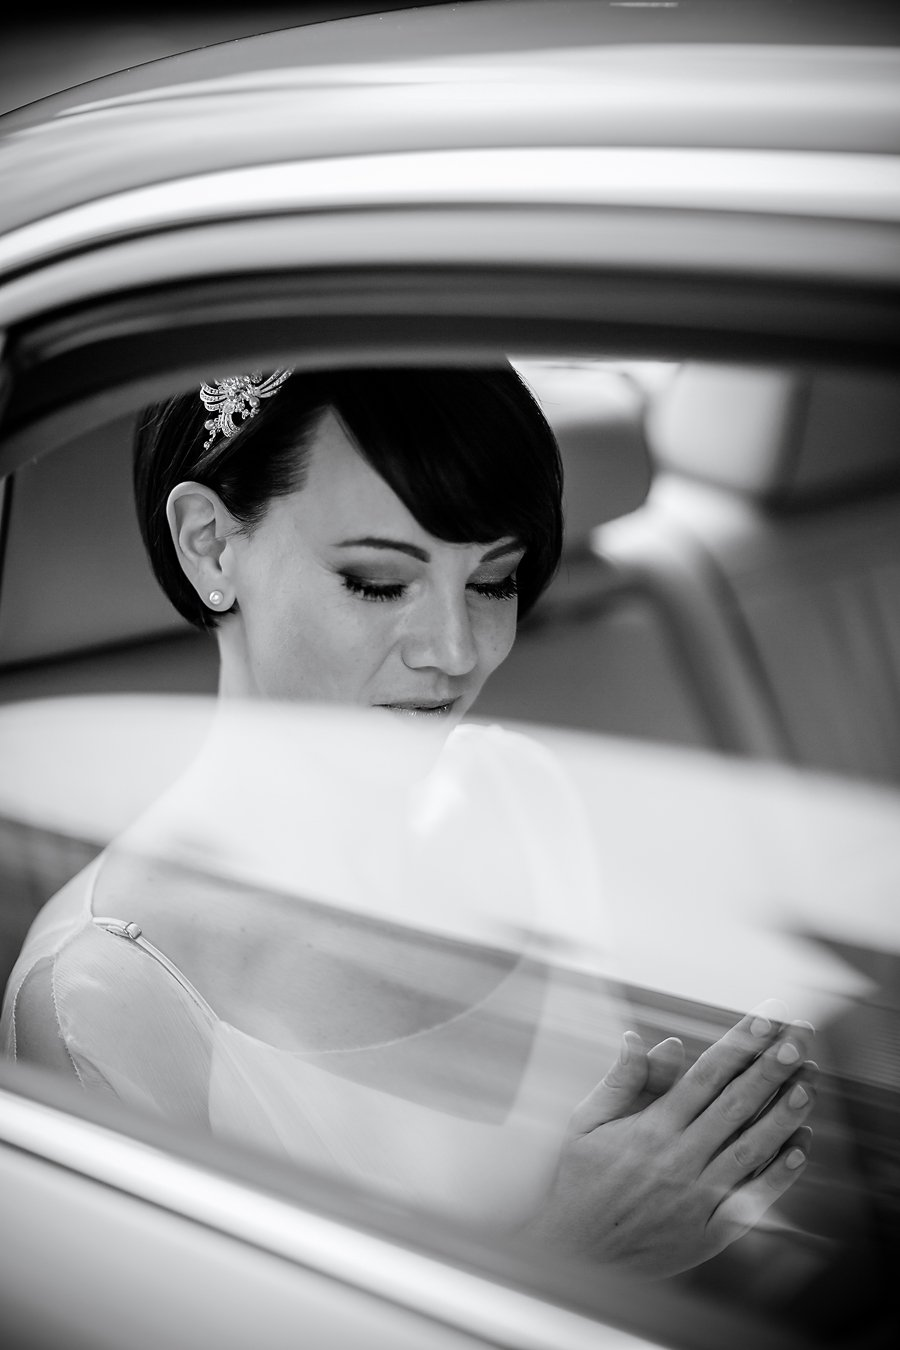 Hochzeitsfotograf Wiesbaden, Fotograf Frankfurt, Braut mit kurzem Haar